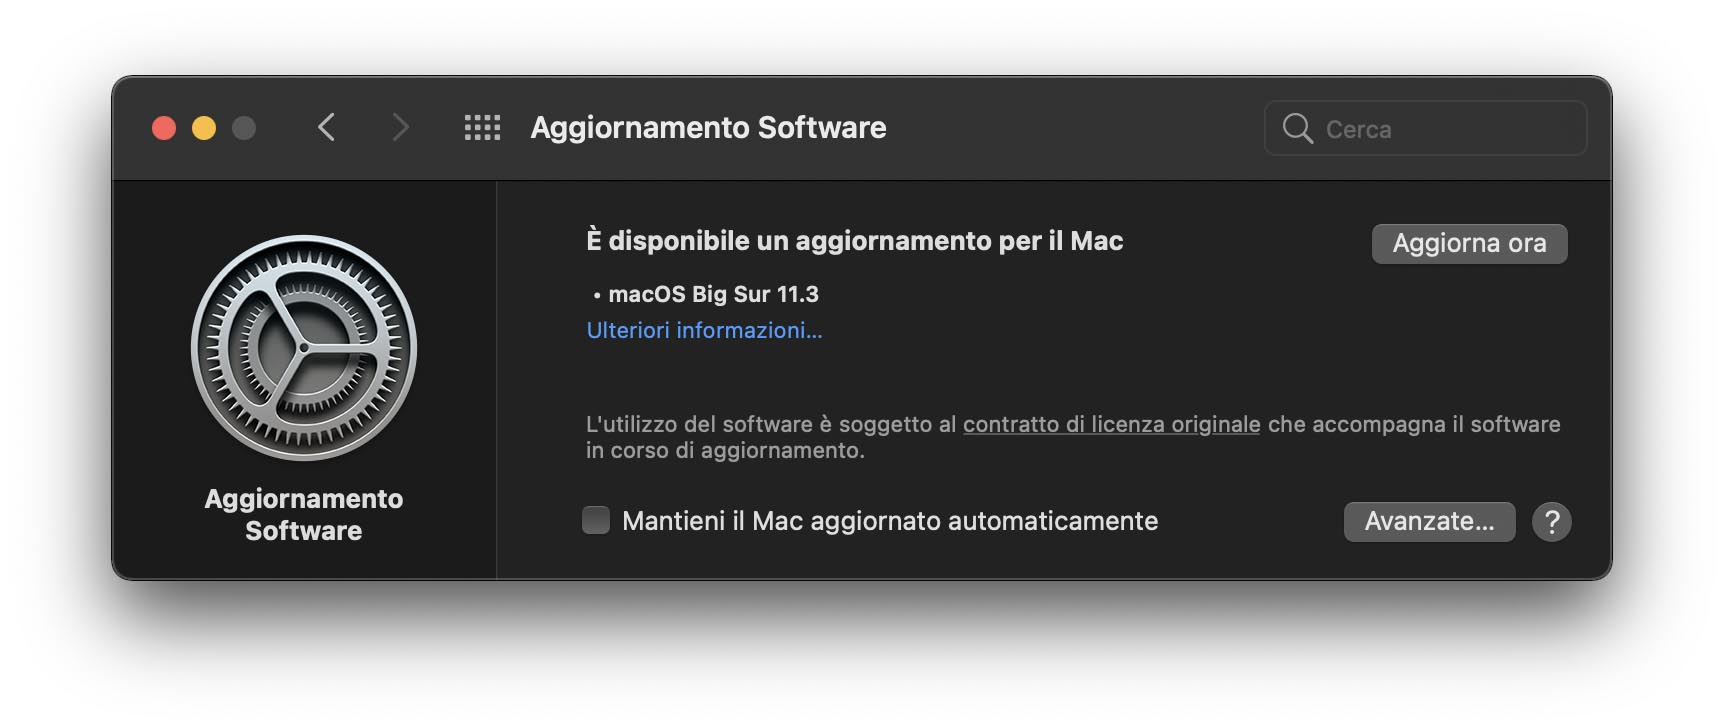 Disponibile aggiornamento a macOS Big Sur 11.3